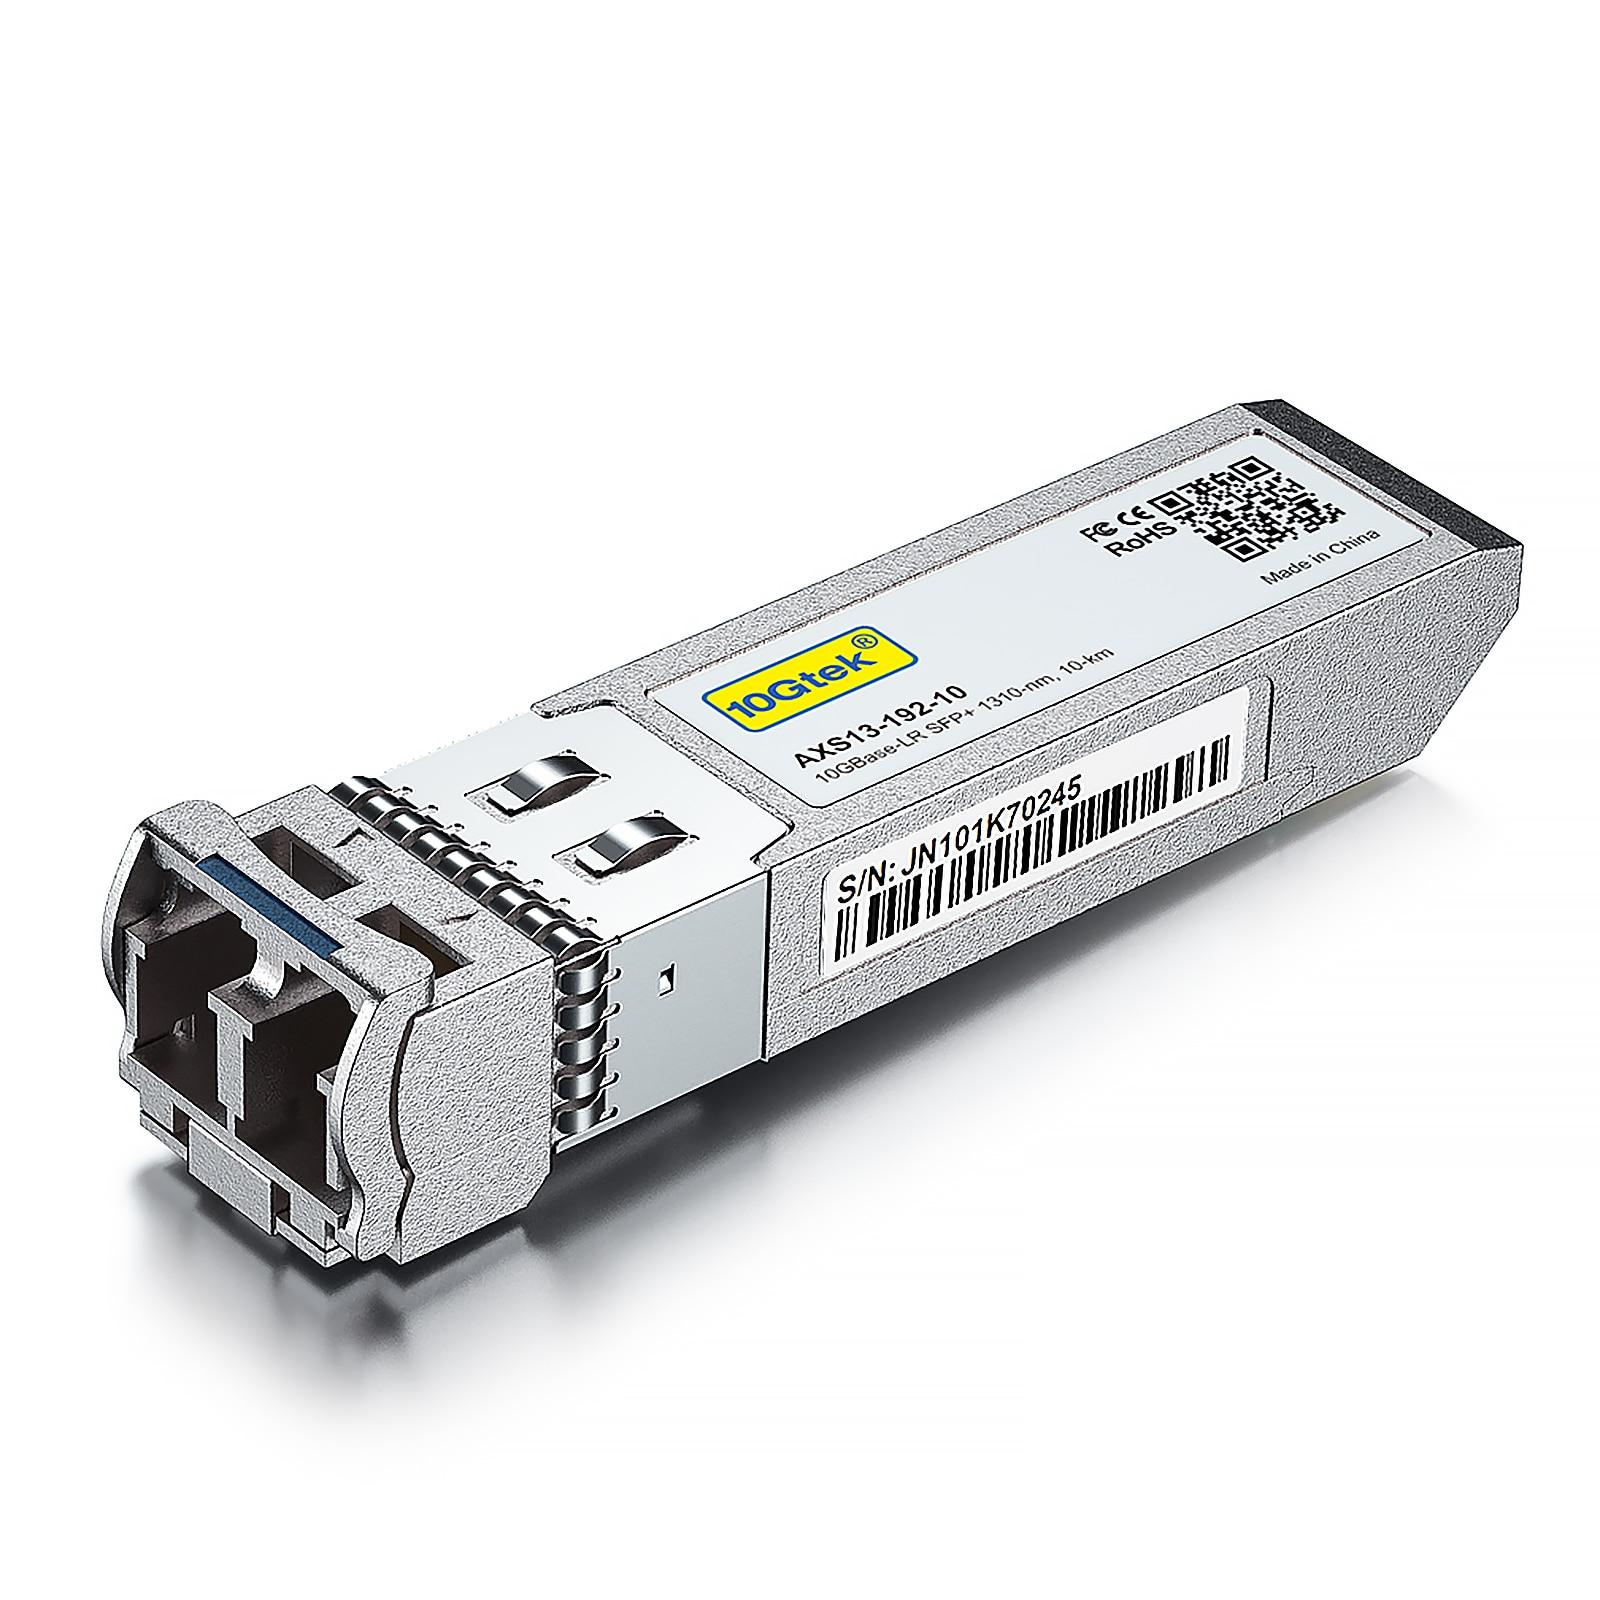 Cisco Compatible, SFP+ LR Module, 10GBase-LR, 10G 1310nm SMF, up to 20 km